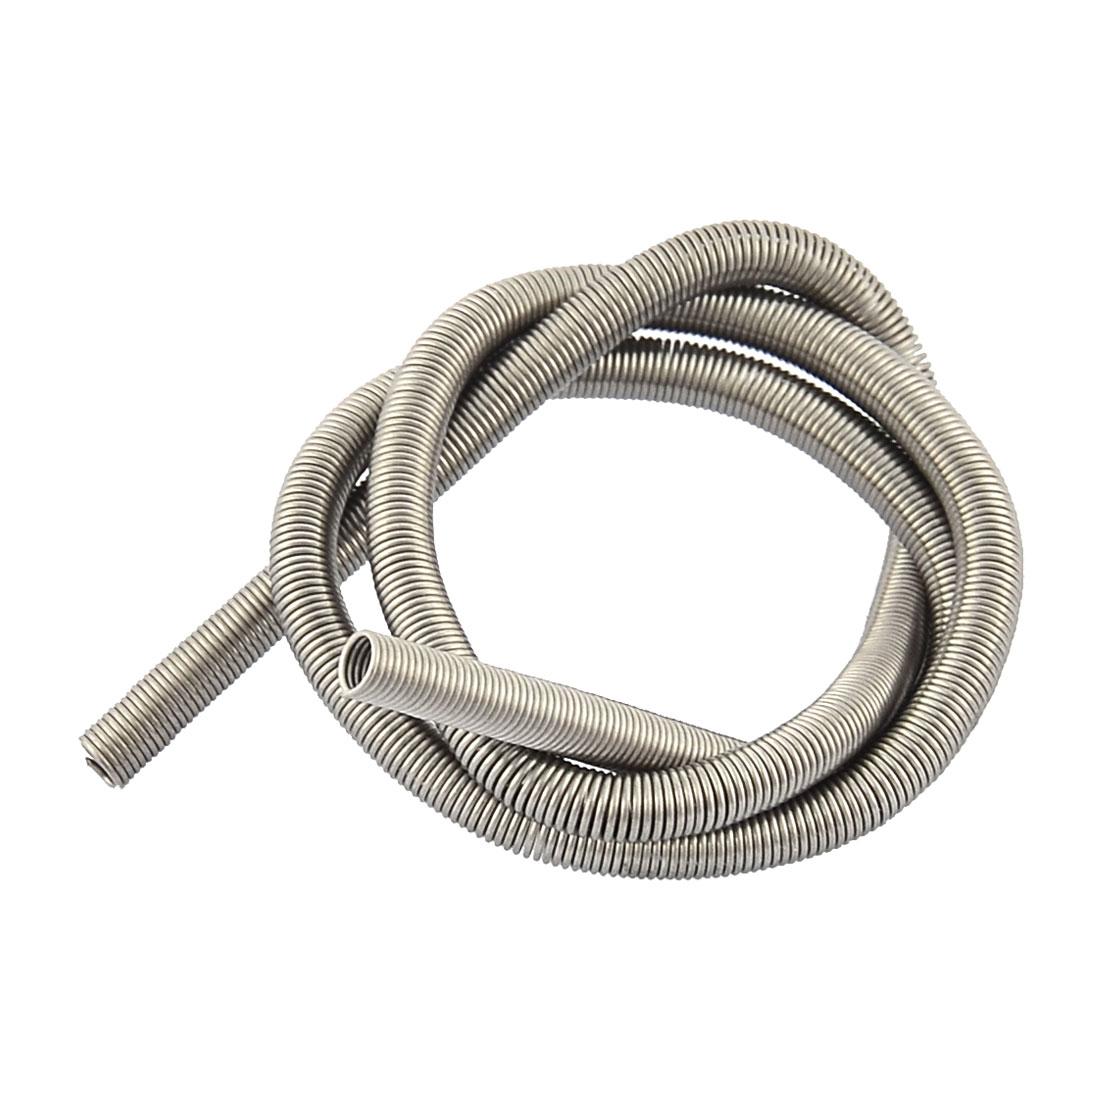 800W Kilns Furnaces Metal Heating Element Coil 35.5cm Long Silver Tone